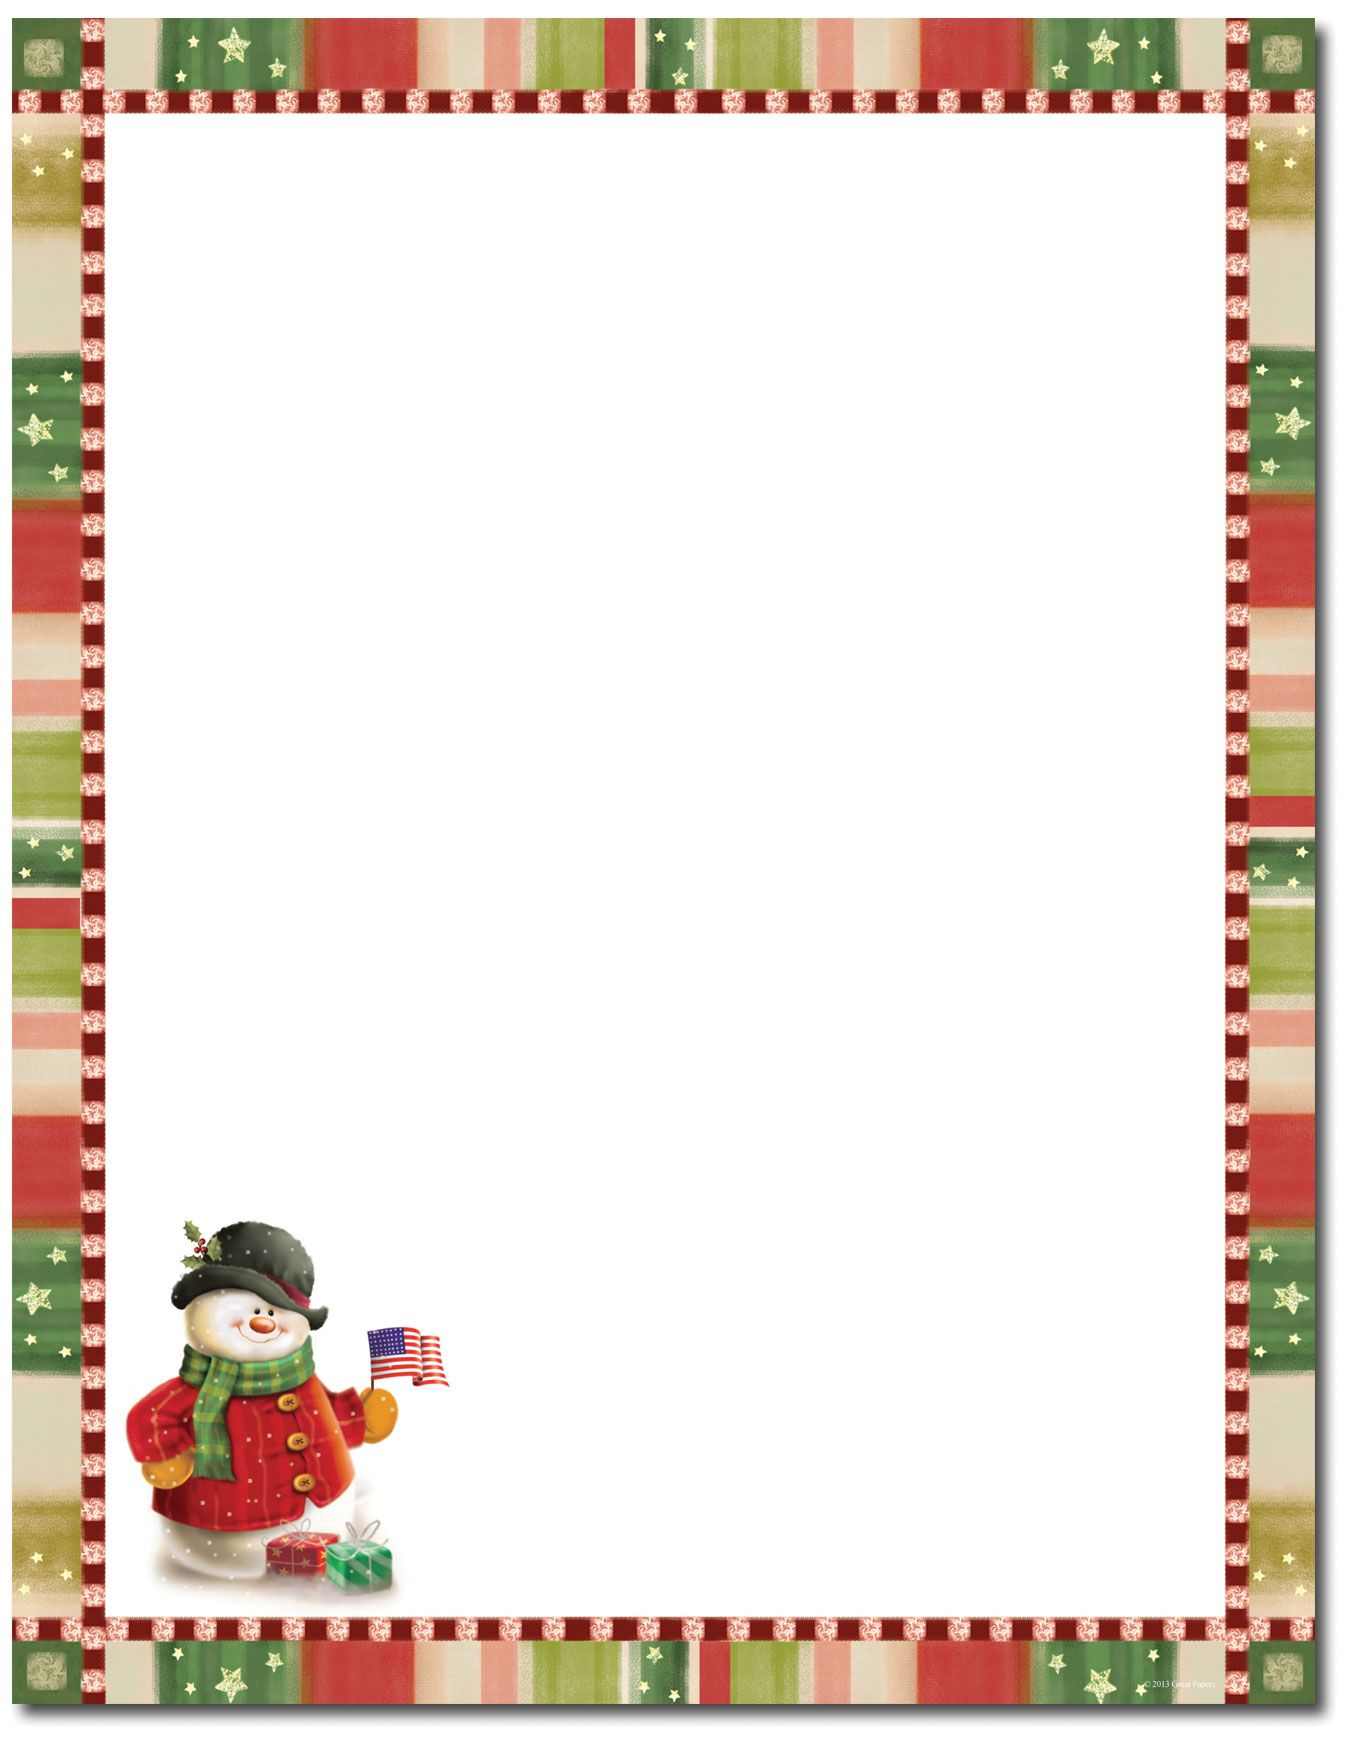 Patriotic Snowman Letterhead | Christmas Stationery | Christmas - Free Printable Christmas Stationary